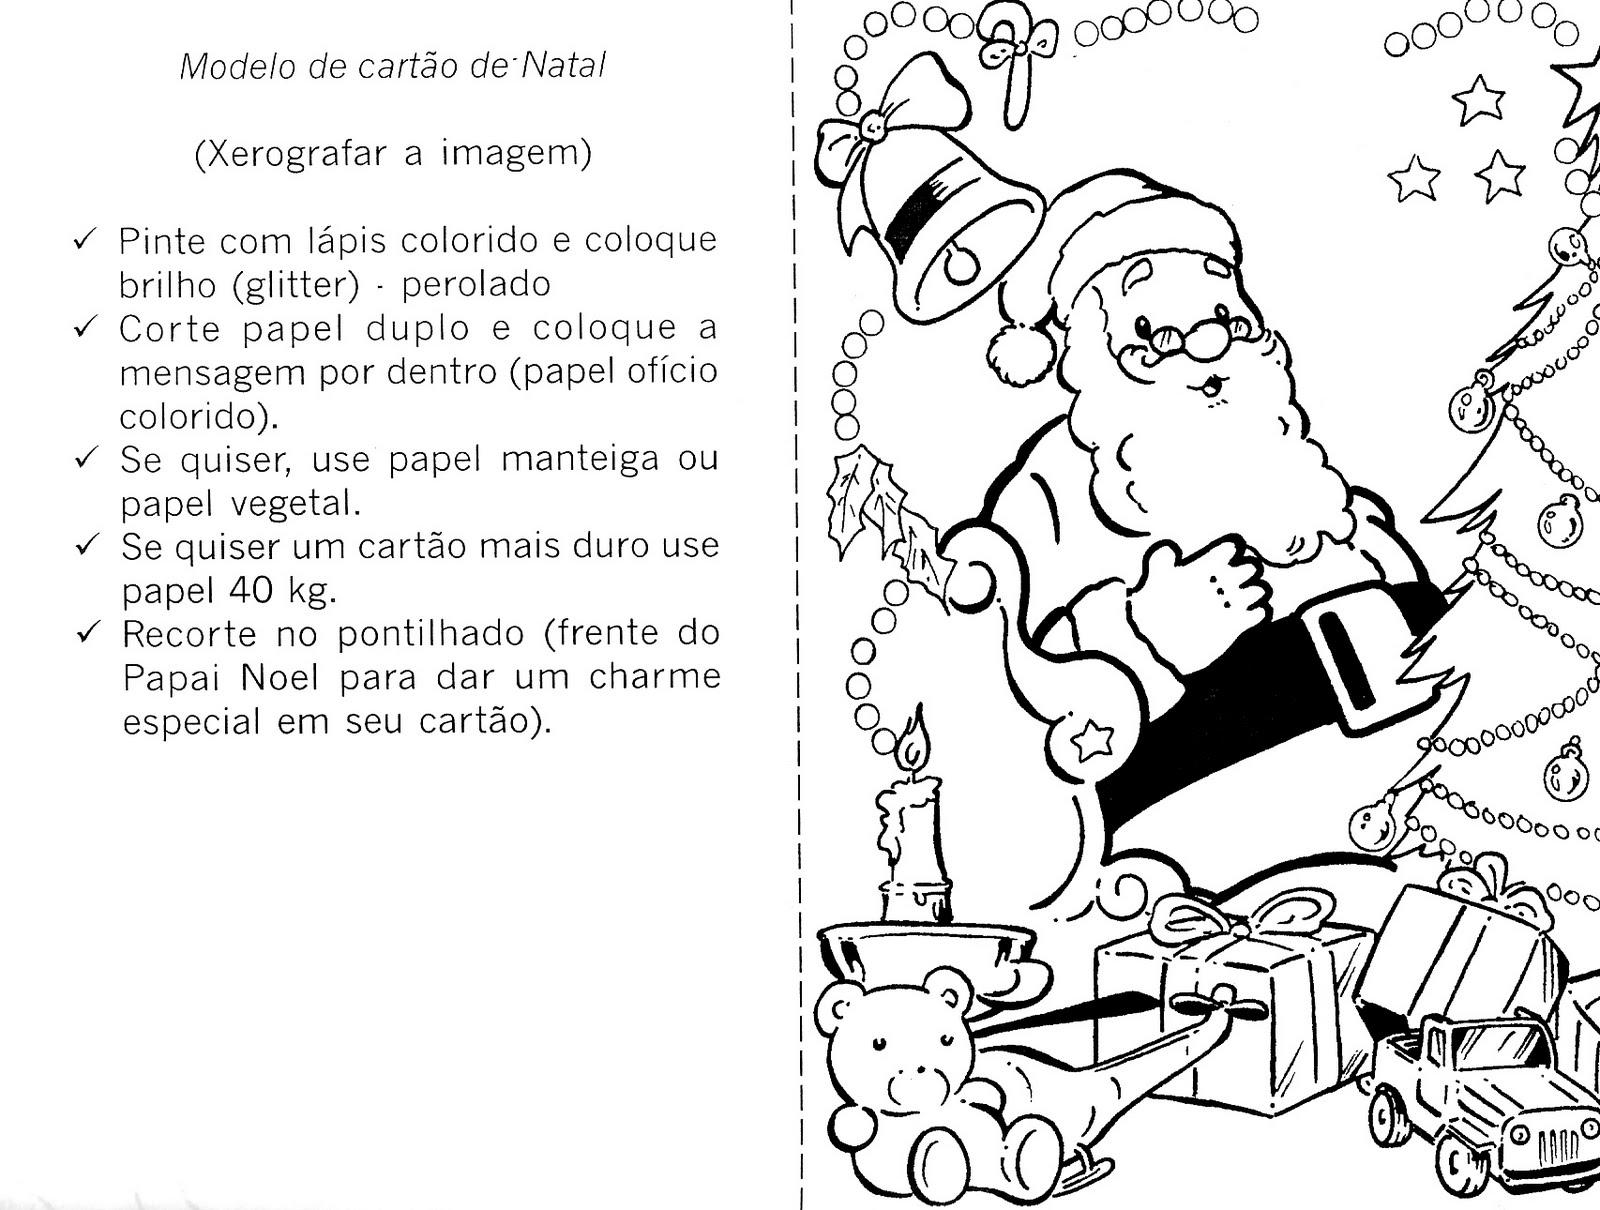 20 Cartoes De Natal Para Colorir E Imprimir Educacao Infantil